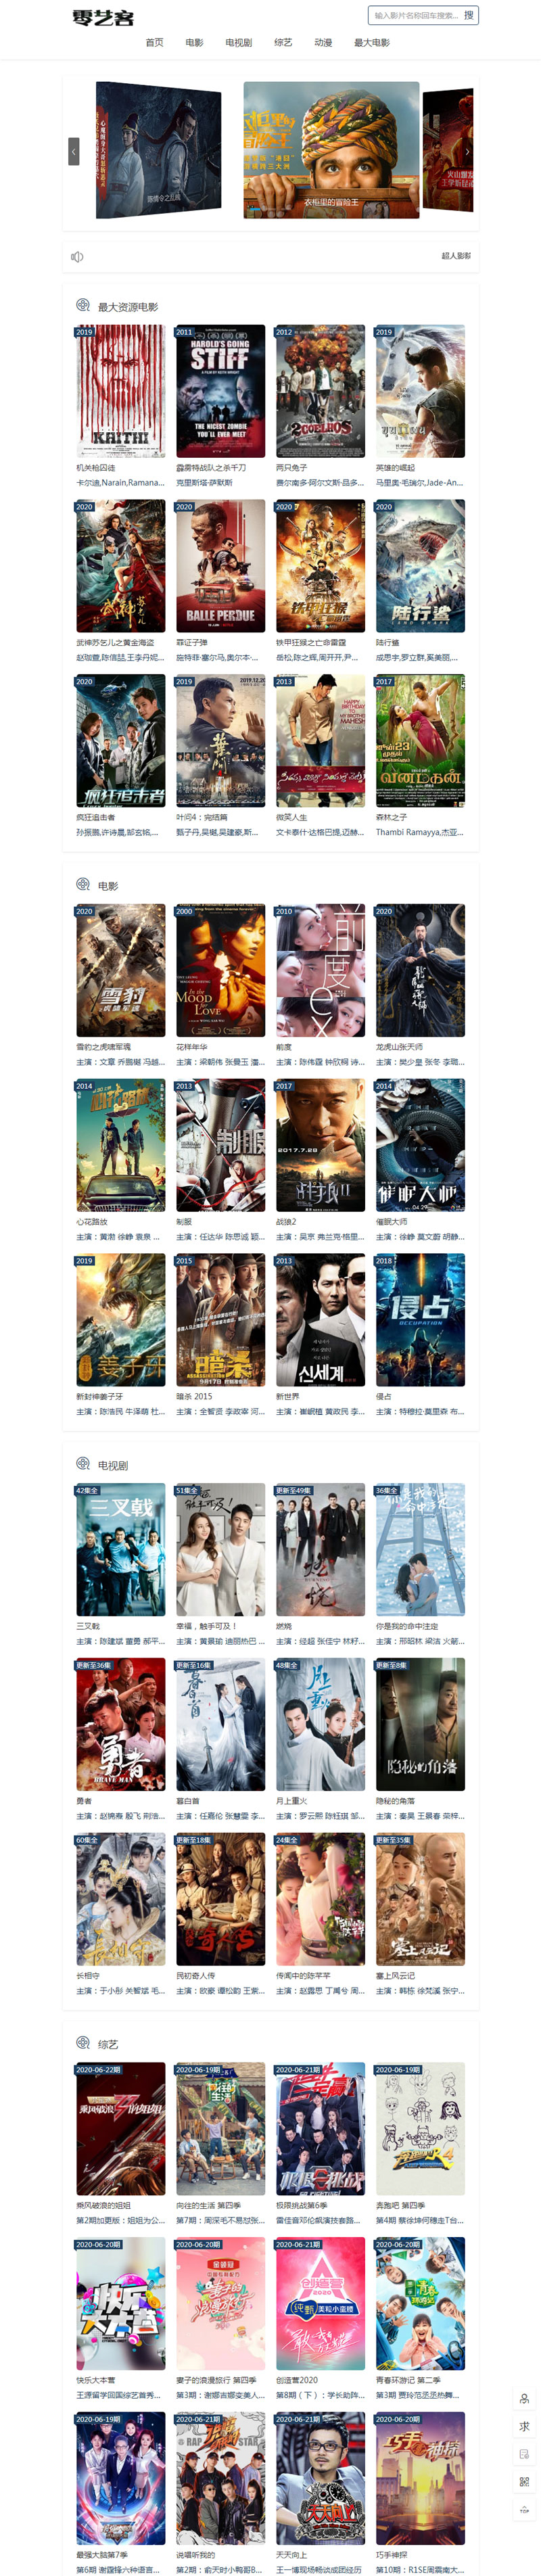 php自动采集电影网站源码